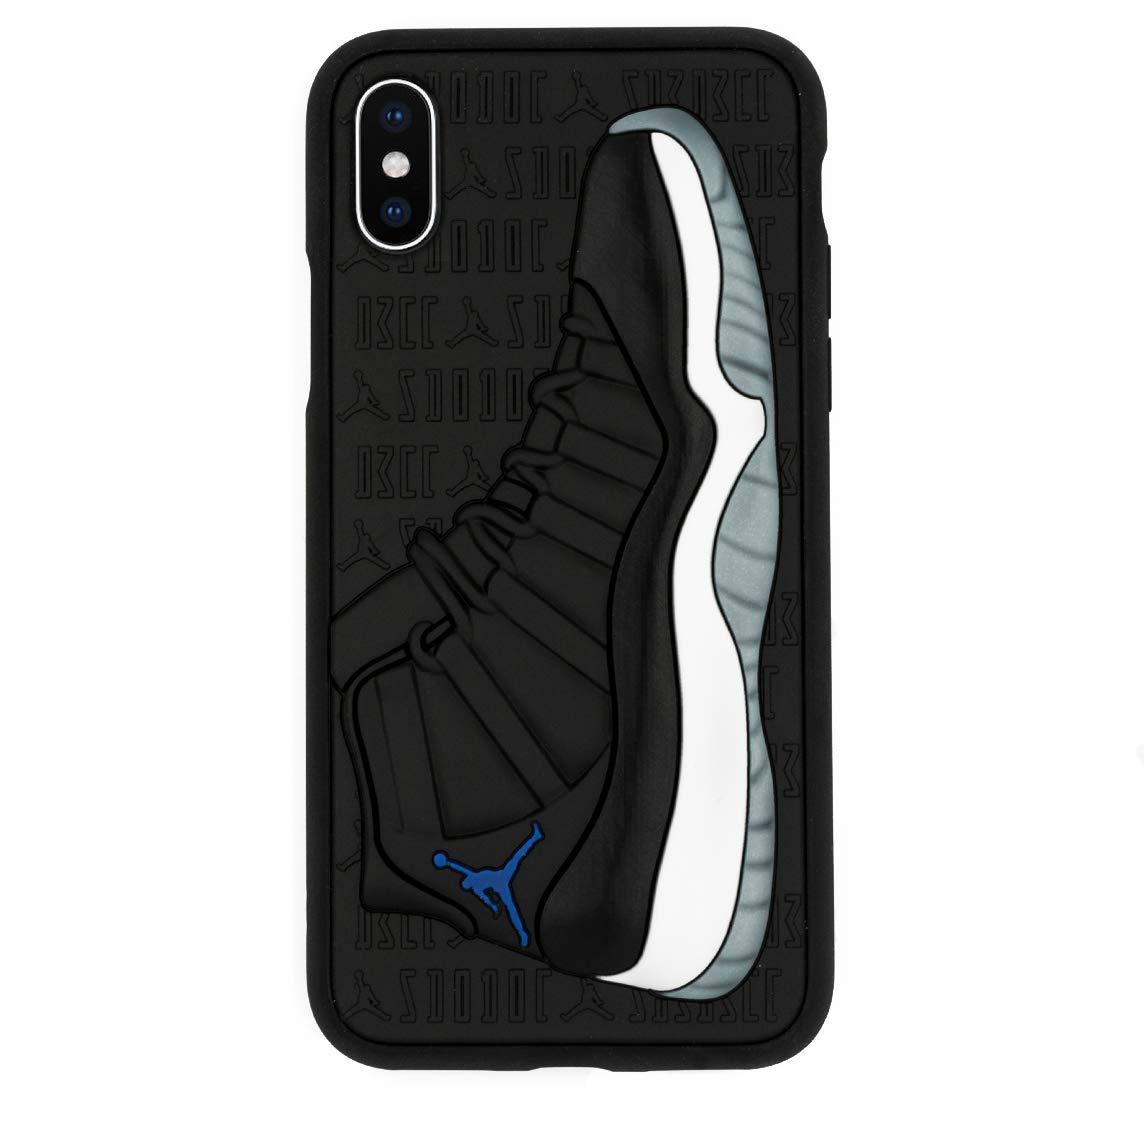 Funda iPhone X Modelo Jordan 11s 3d Textured [7h3gr9ds]